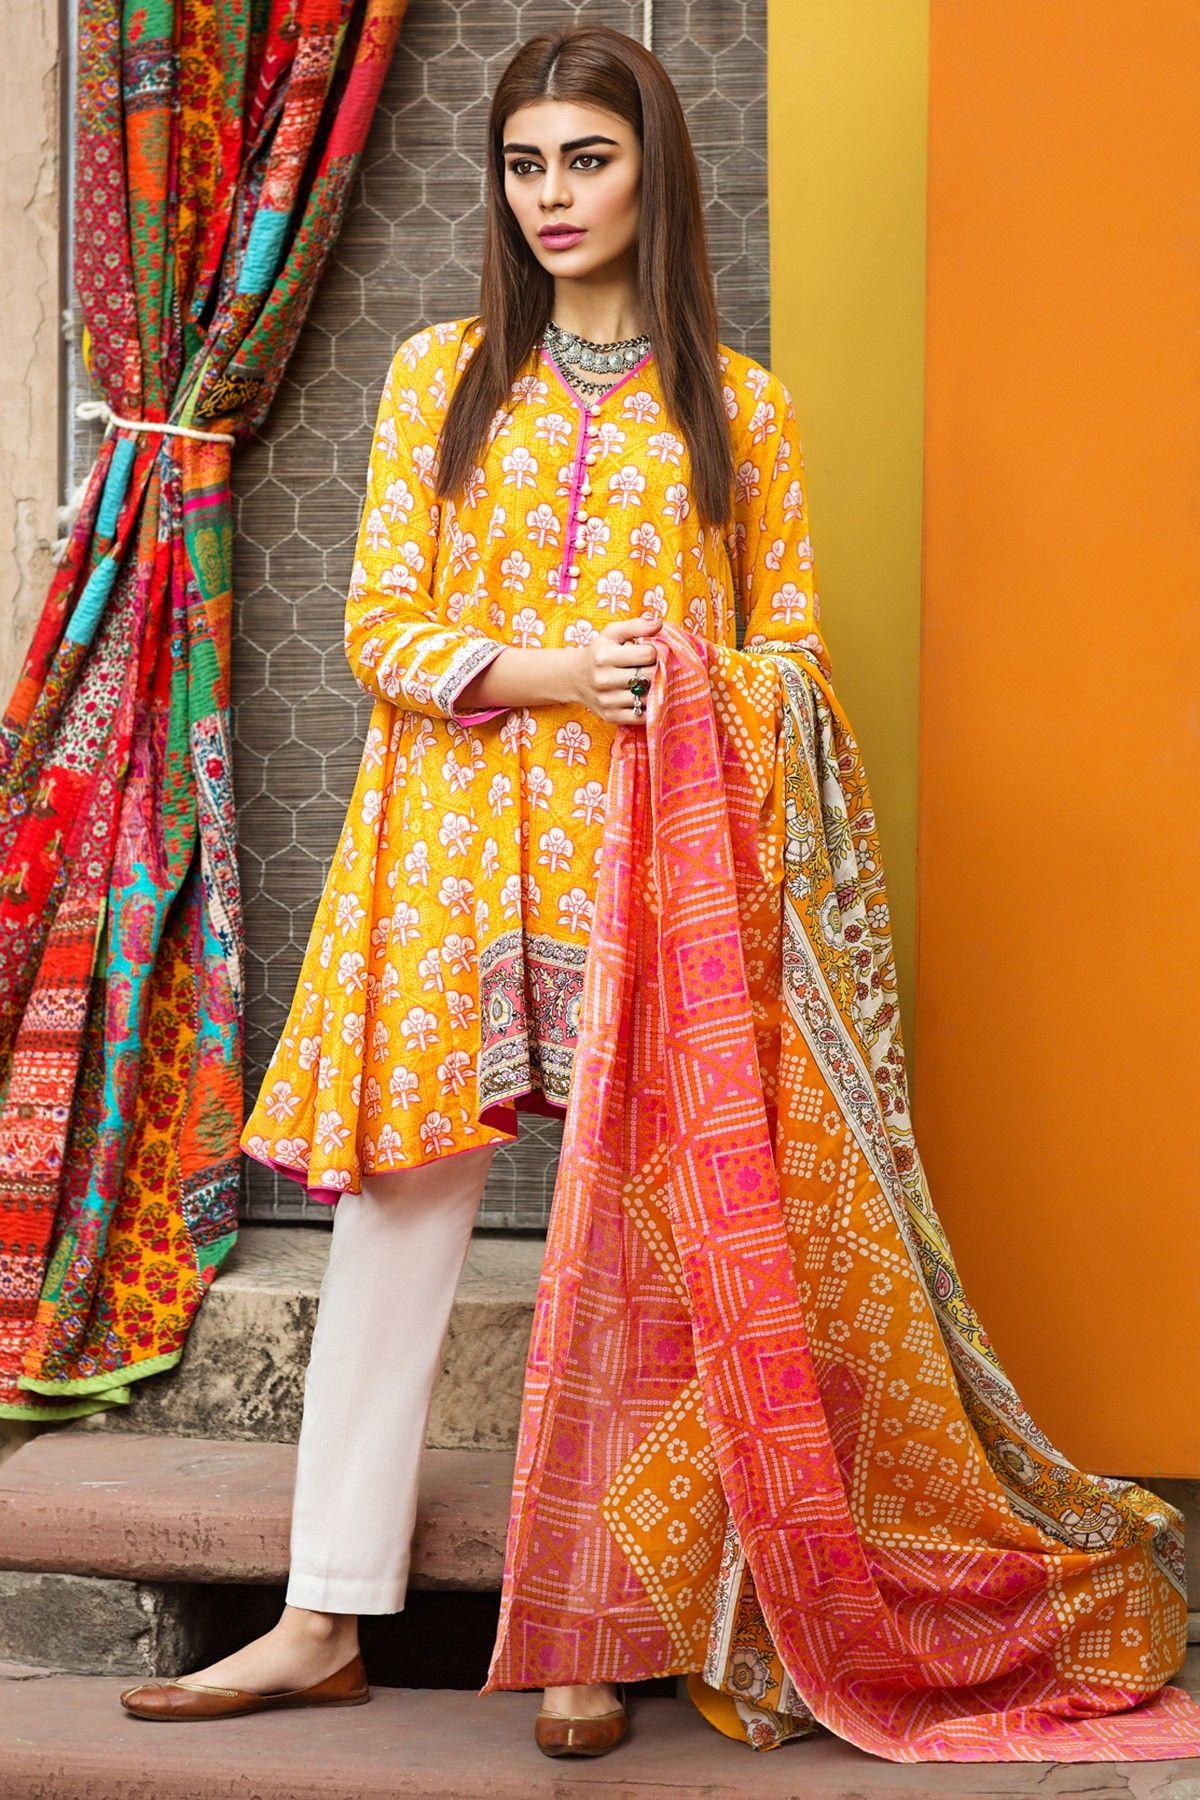 Khaadi latest summer lawn dresses designs collection also rh nl pinterest